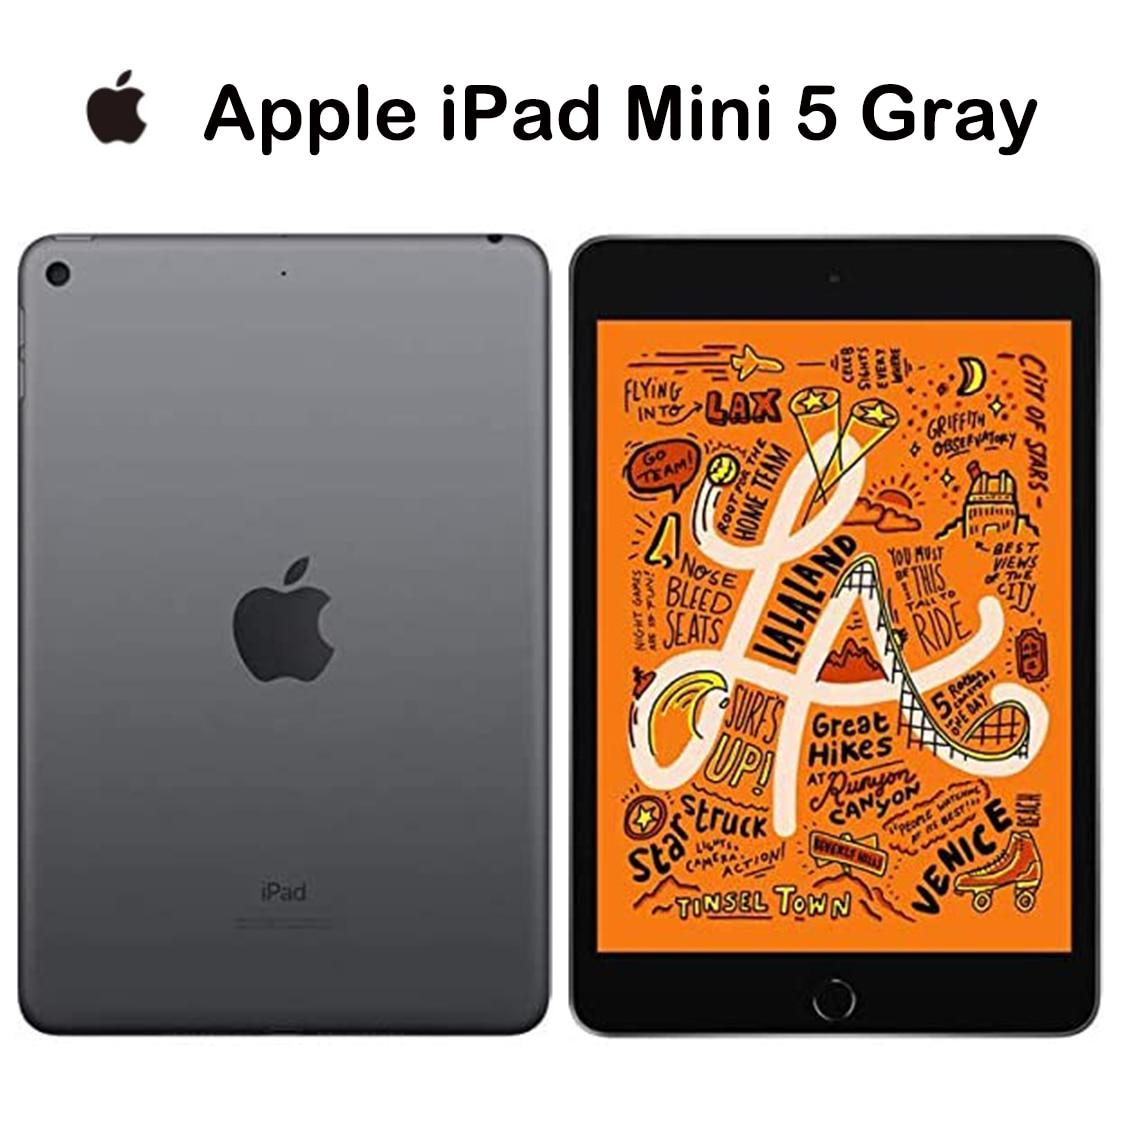 New original 2019 Apple iPad Mini 5 64GB Space Gray WiFi version 7.9 inch Retina Display A12 Chip Touch ID IOS